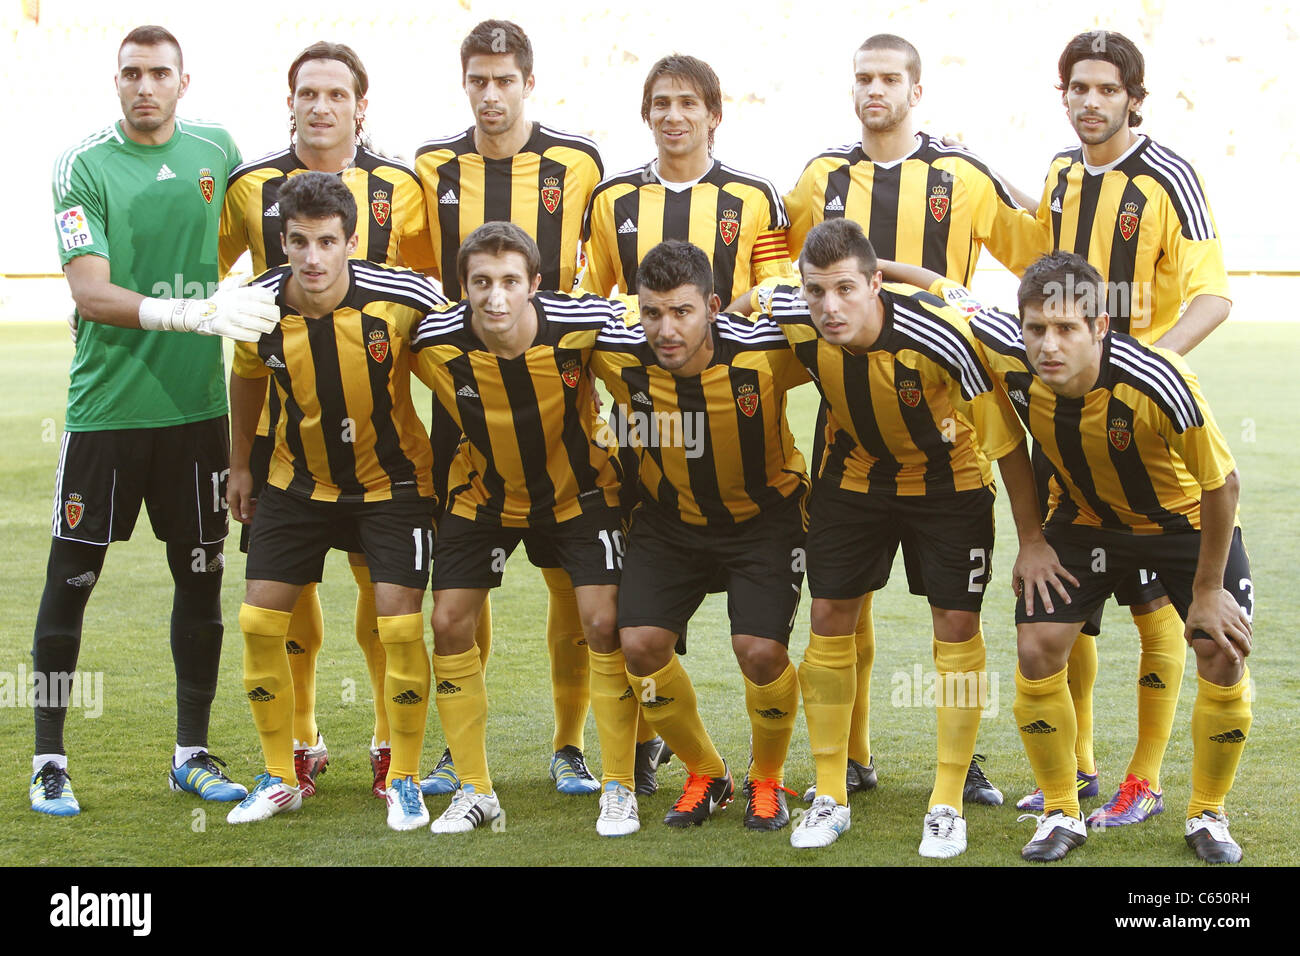 Zaragoza team group line-up performing for Pre season match between Numancia and Zaragoza. - Stock Image